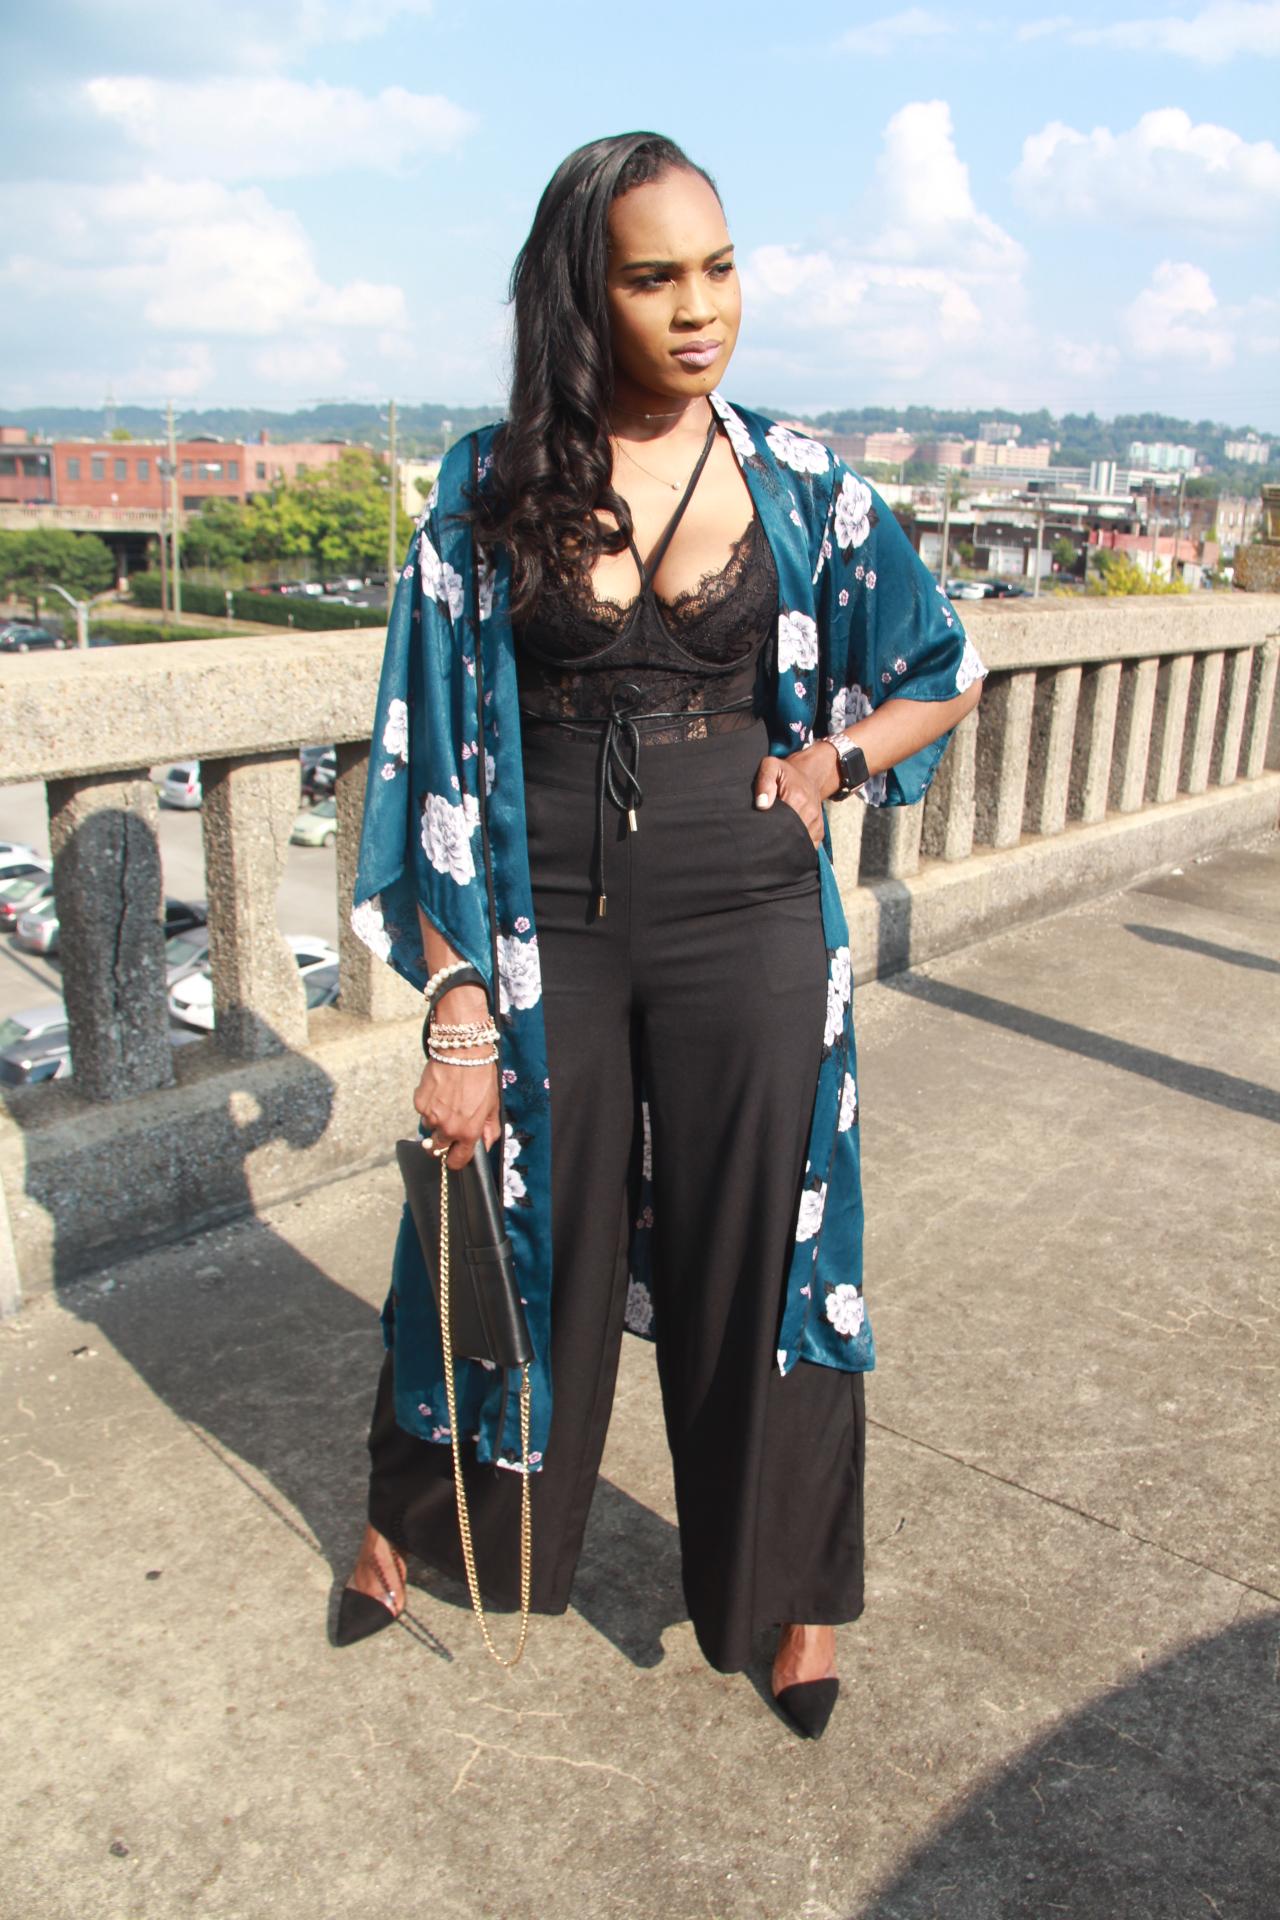 Style-files-Monteau-Green-floral-kimono-Boohoo-Wideleg-pants-zara-pvc-clear-black-pumps-forever21-lace-corset-bodysuit-ooohlalablog-4